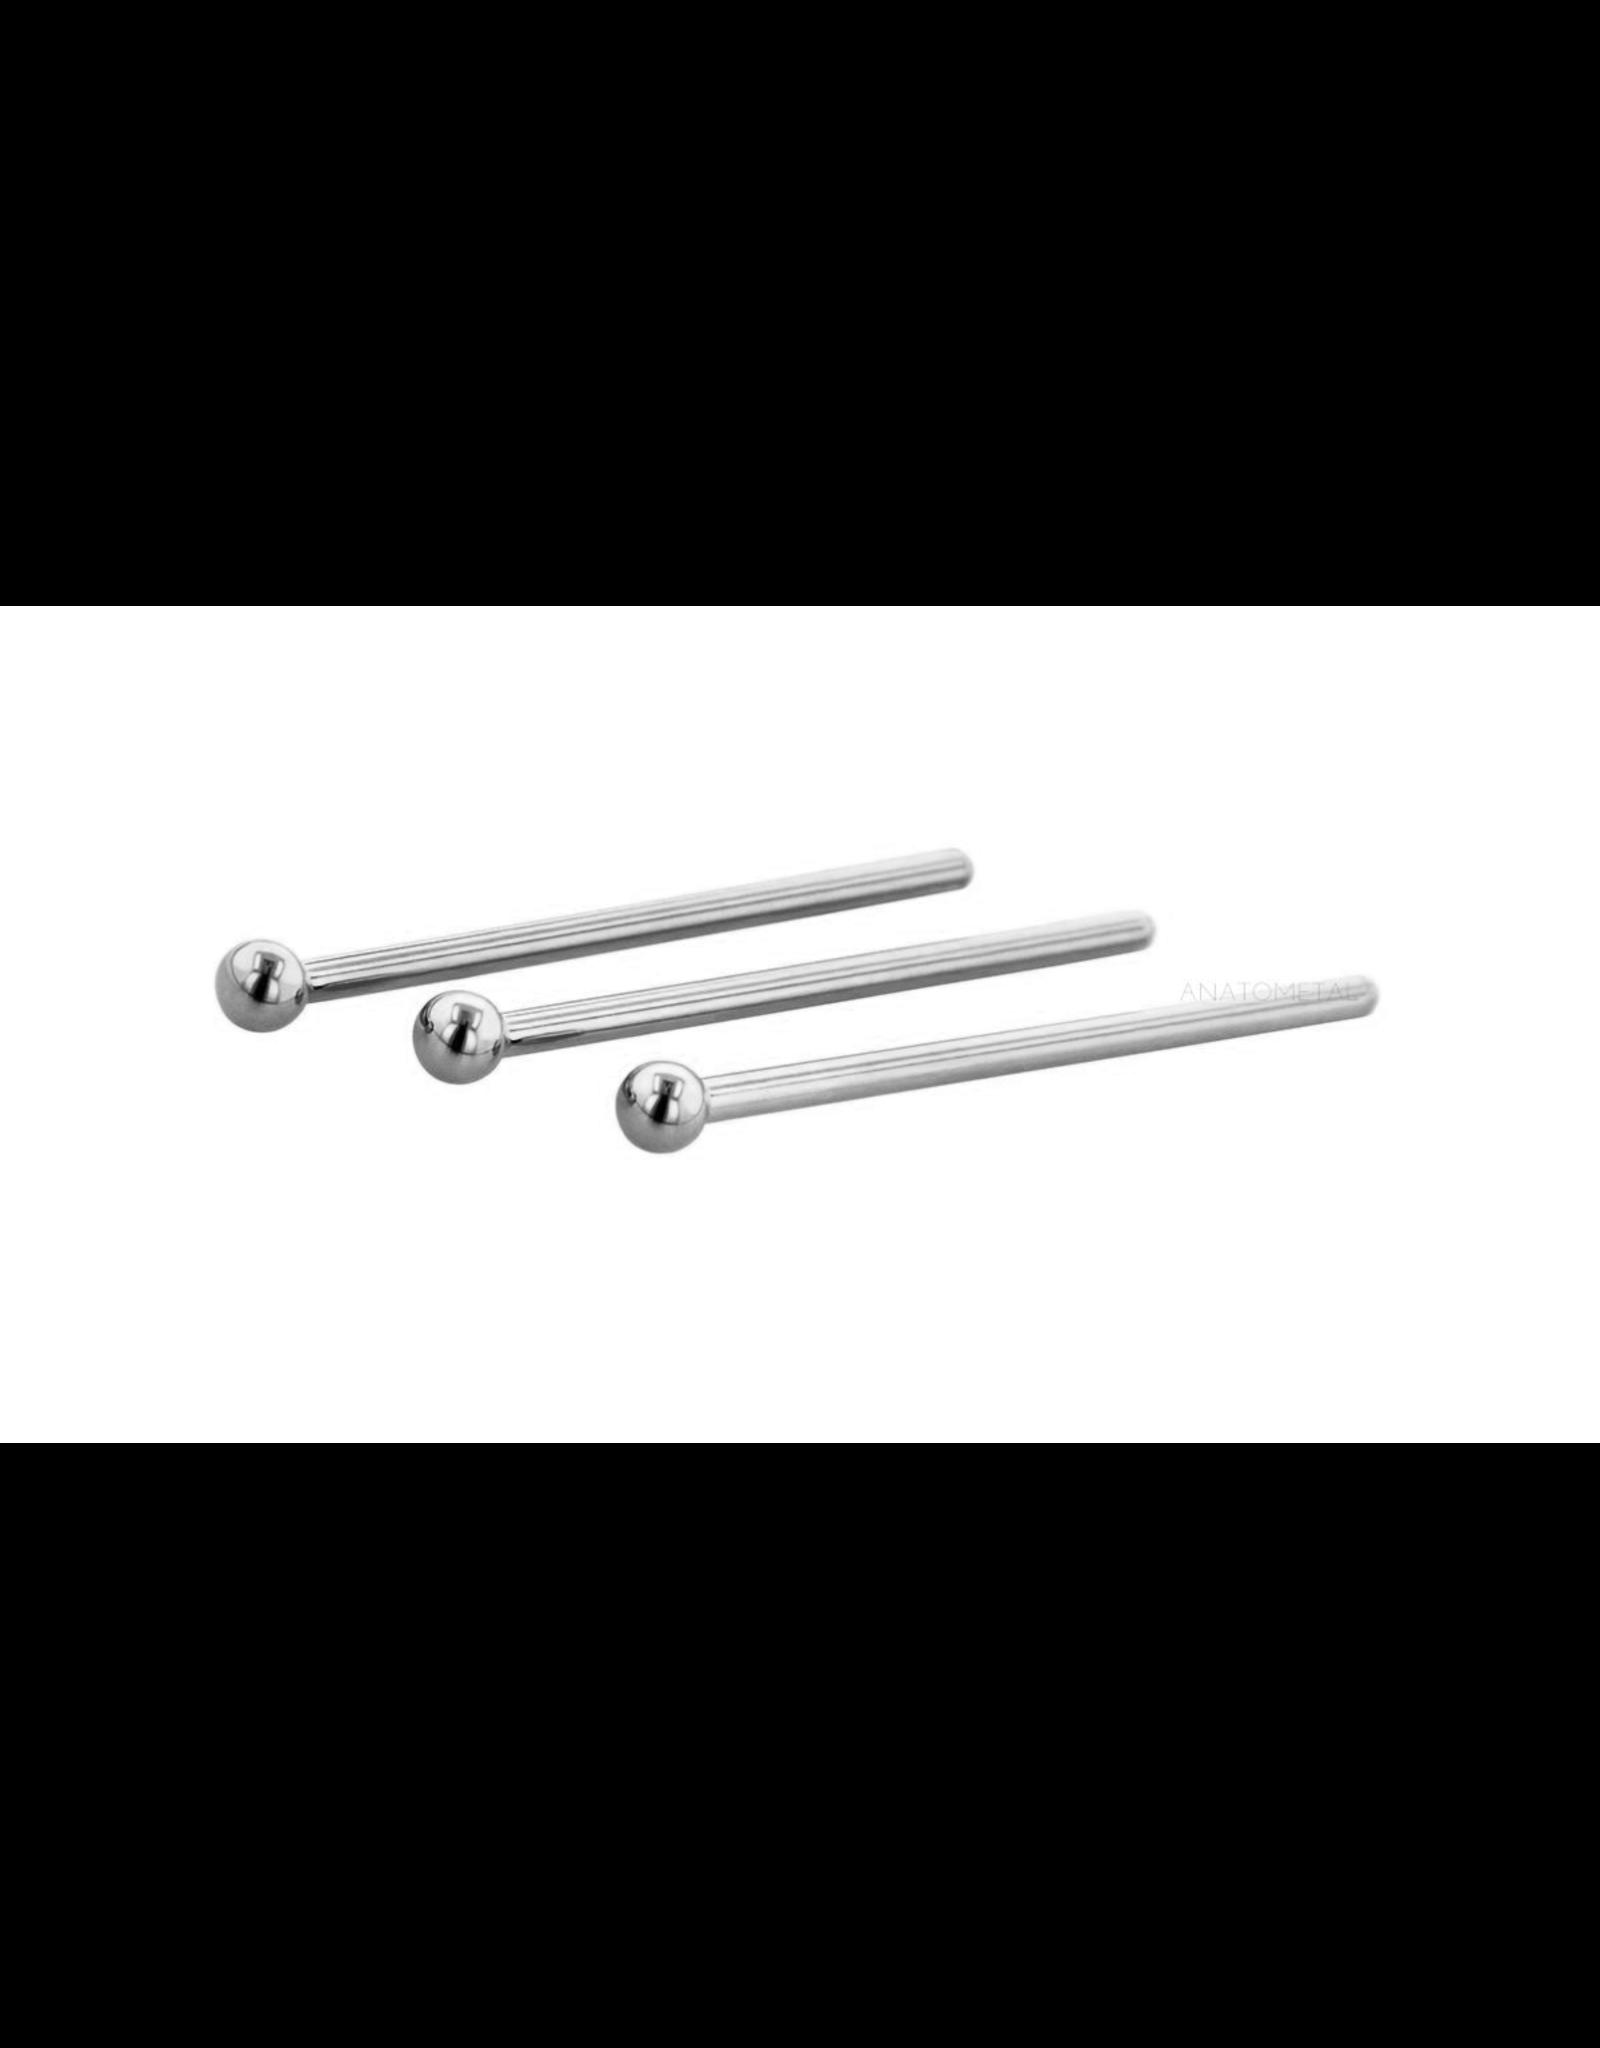 Anatometal Anatometal 20g Steel Shape Nostril Screw